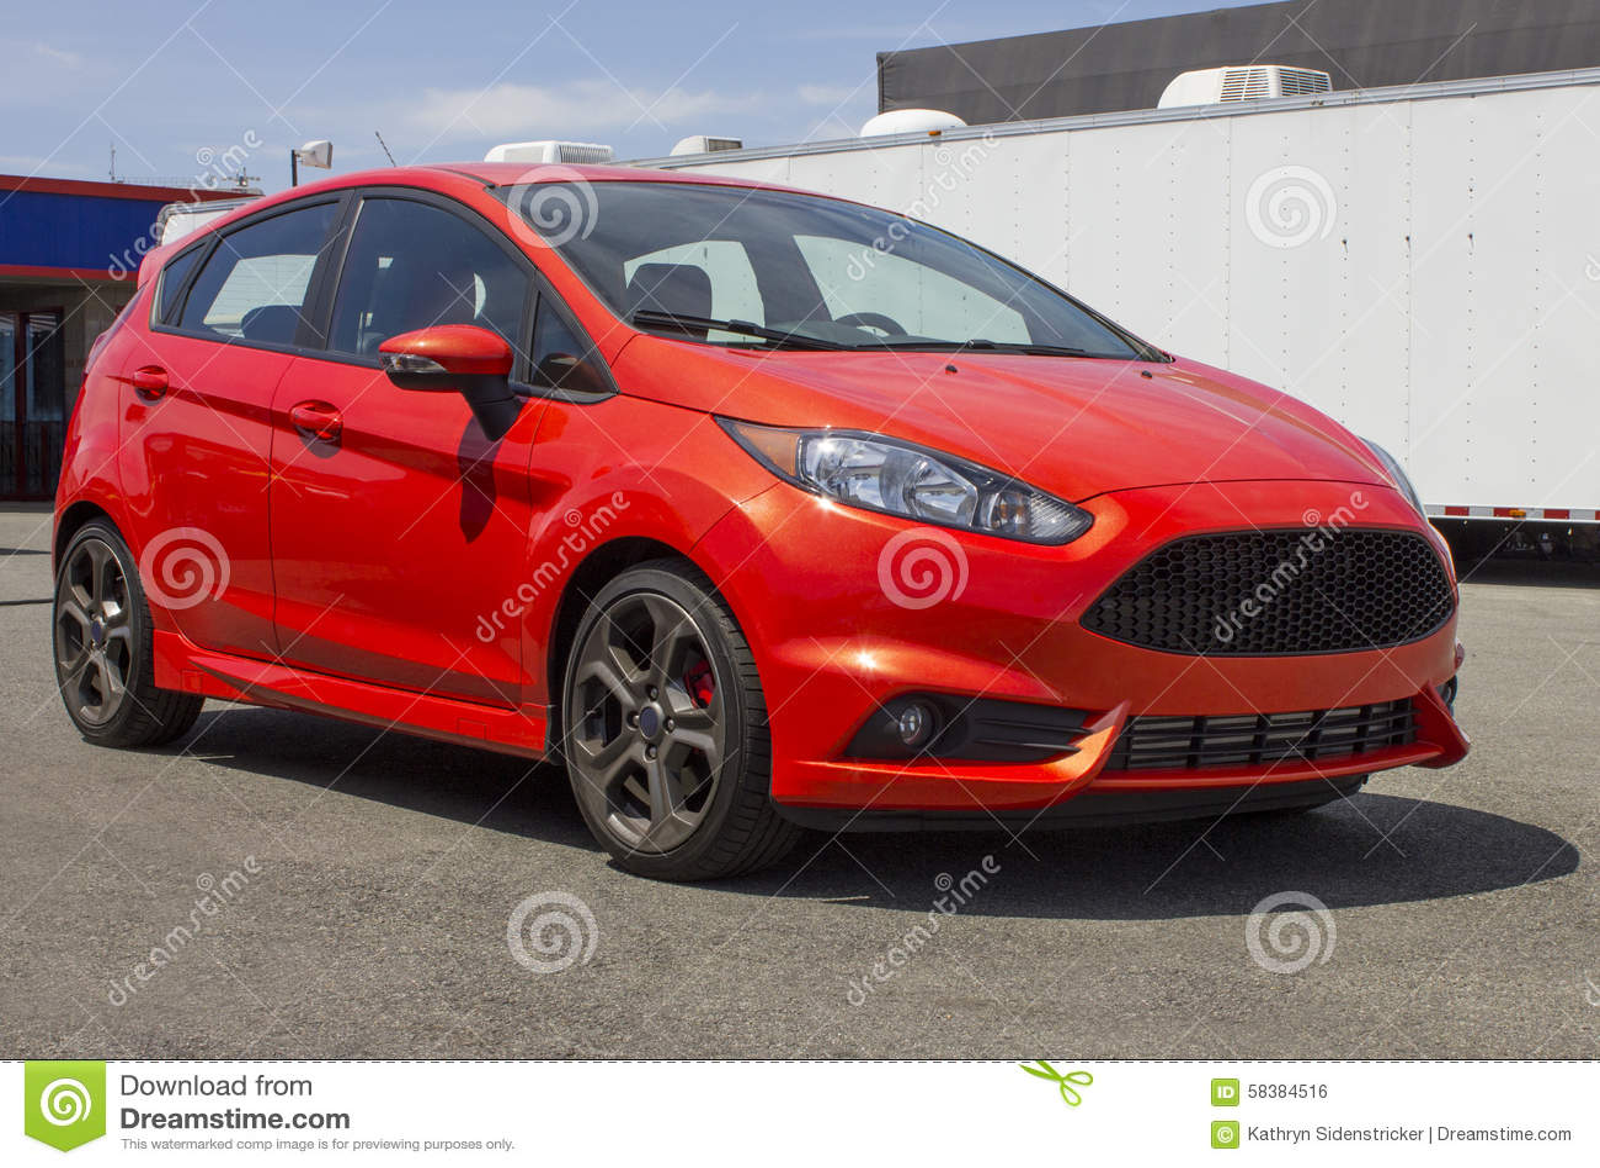 2015 Ford Festiva ST Hatchback Red Stock Photo Image